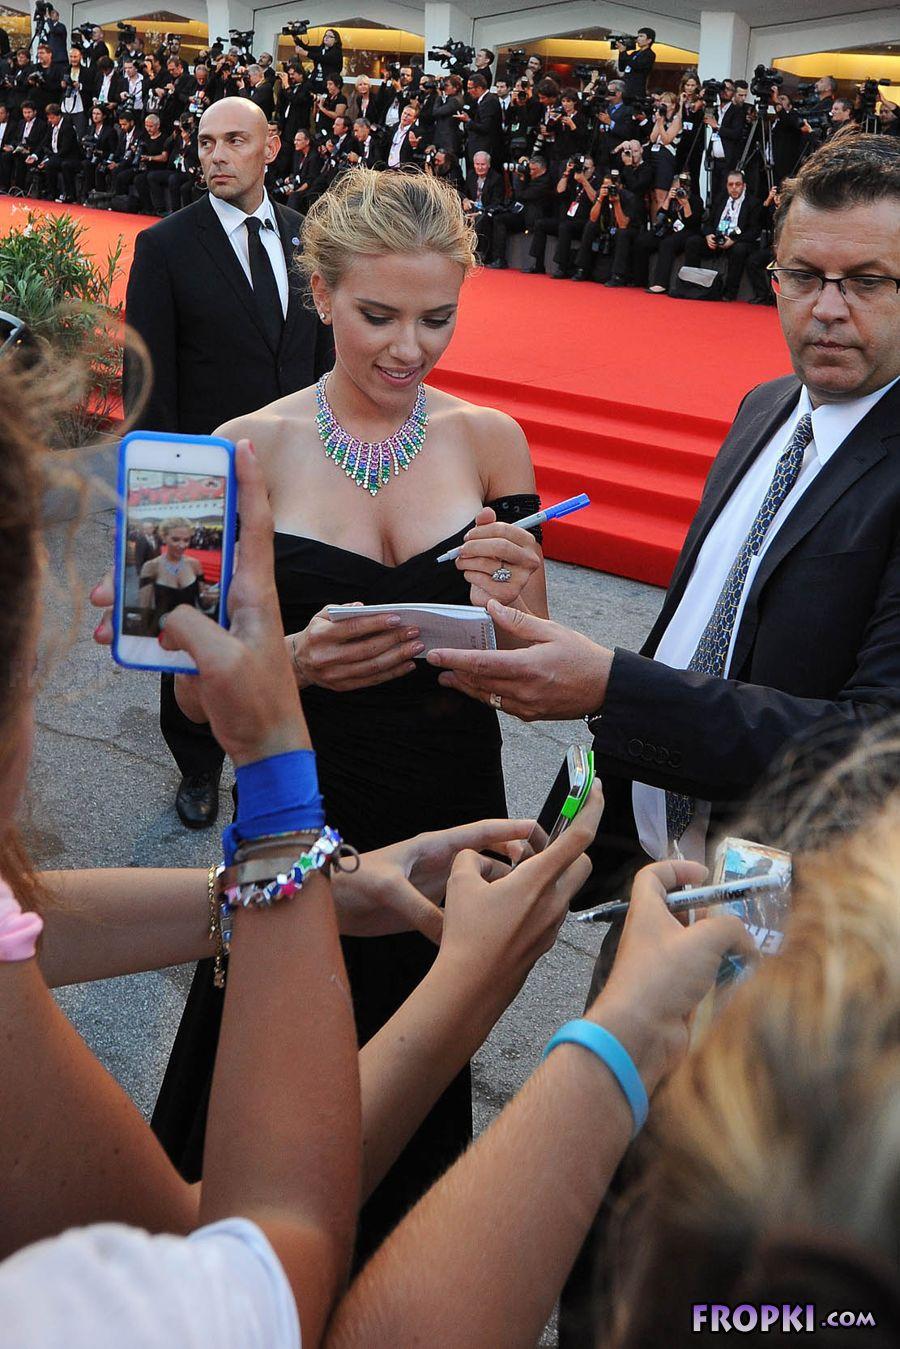 Scarlett Johansson Fropki 09